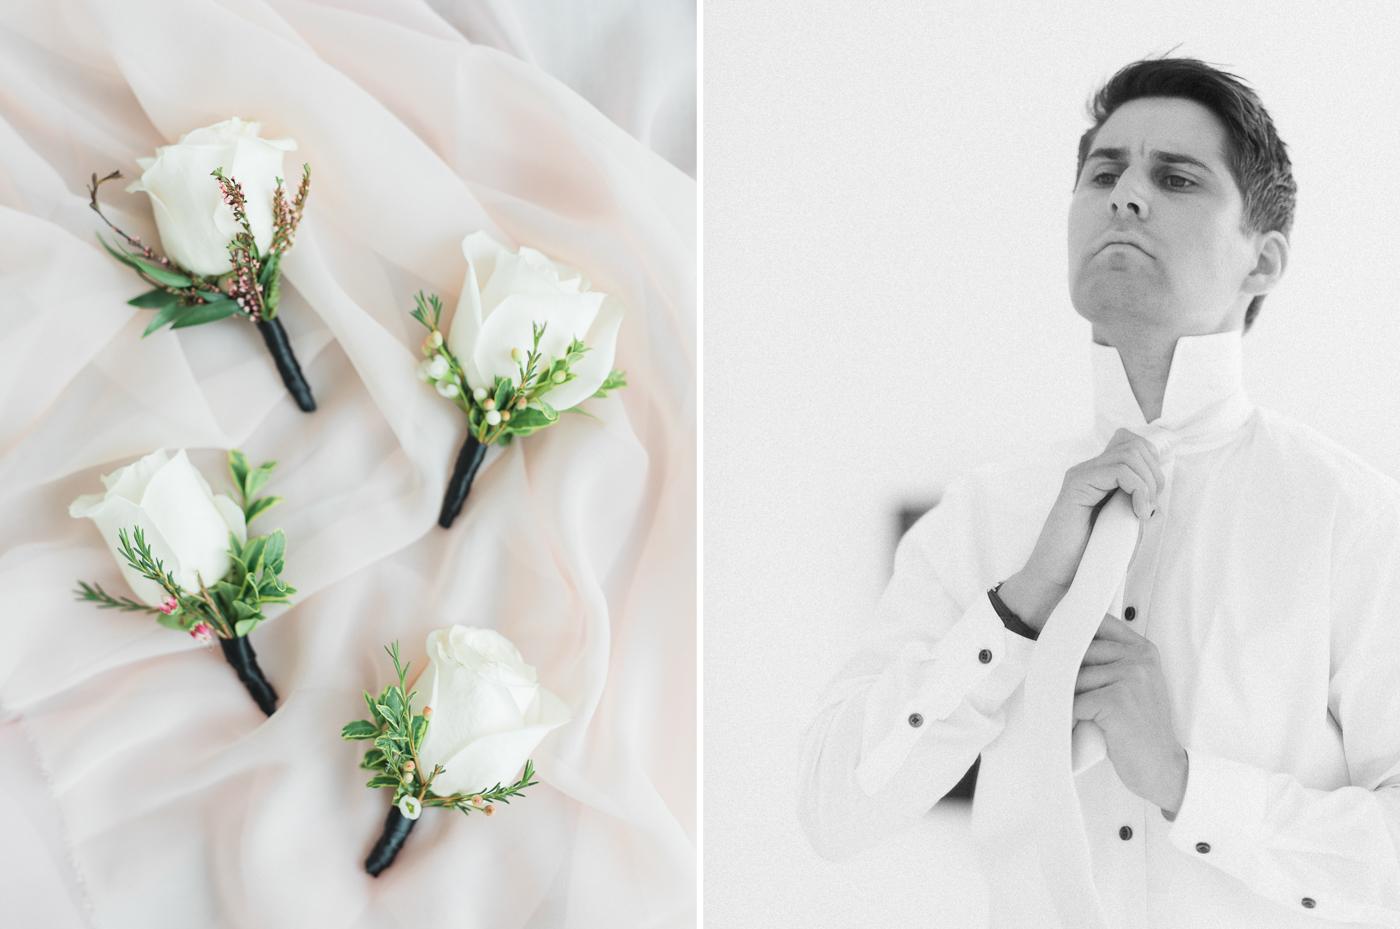 AKP_S&F_Malibu_Wedding_Fine_Art_Photography_Los_Angeles-5_boutonniere.jpg